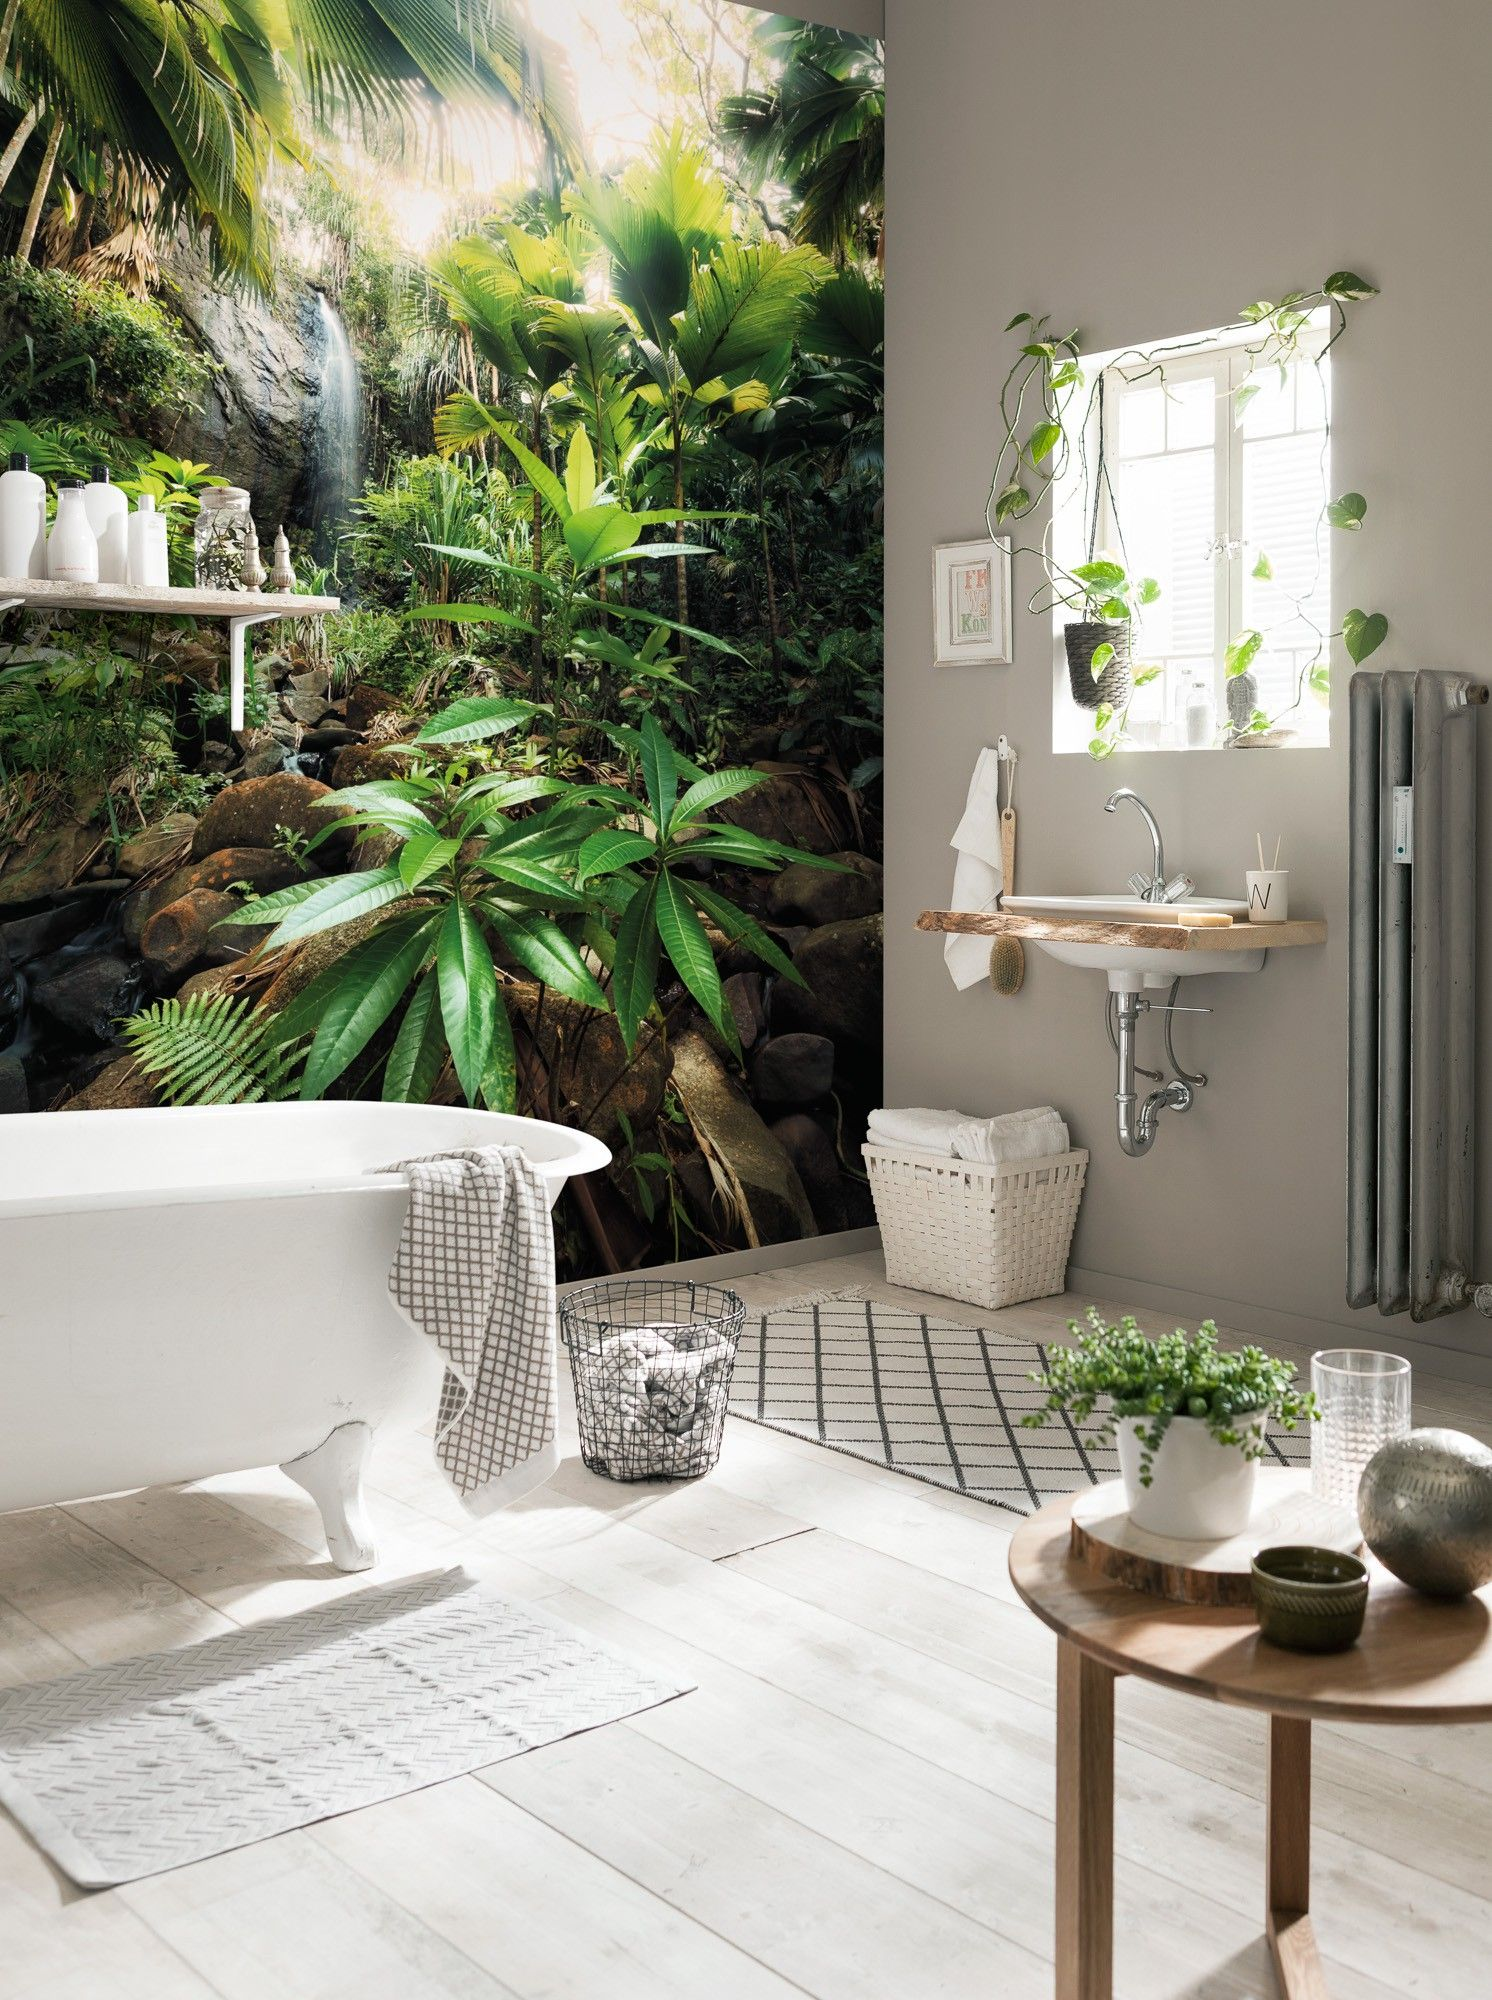 Spirit Dekor Wandbild Wand Tropisches Badezimmer